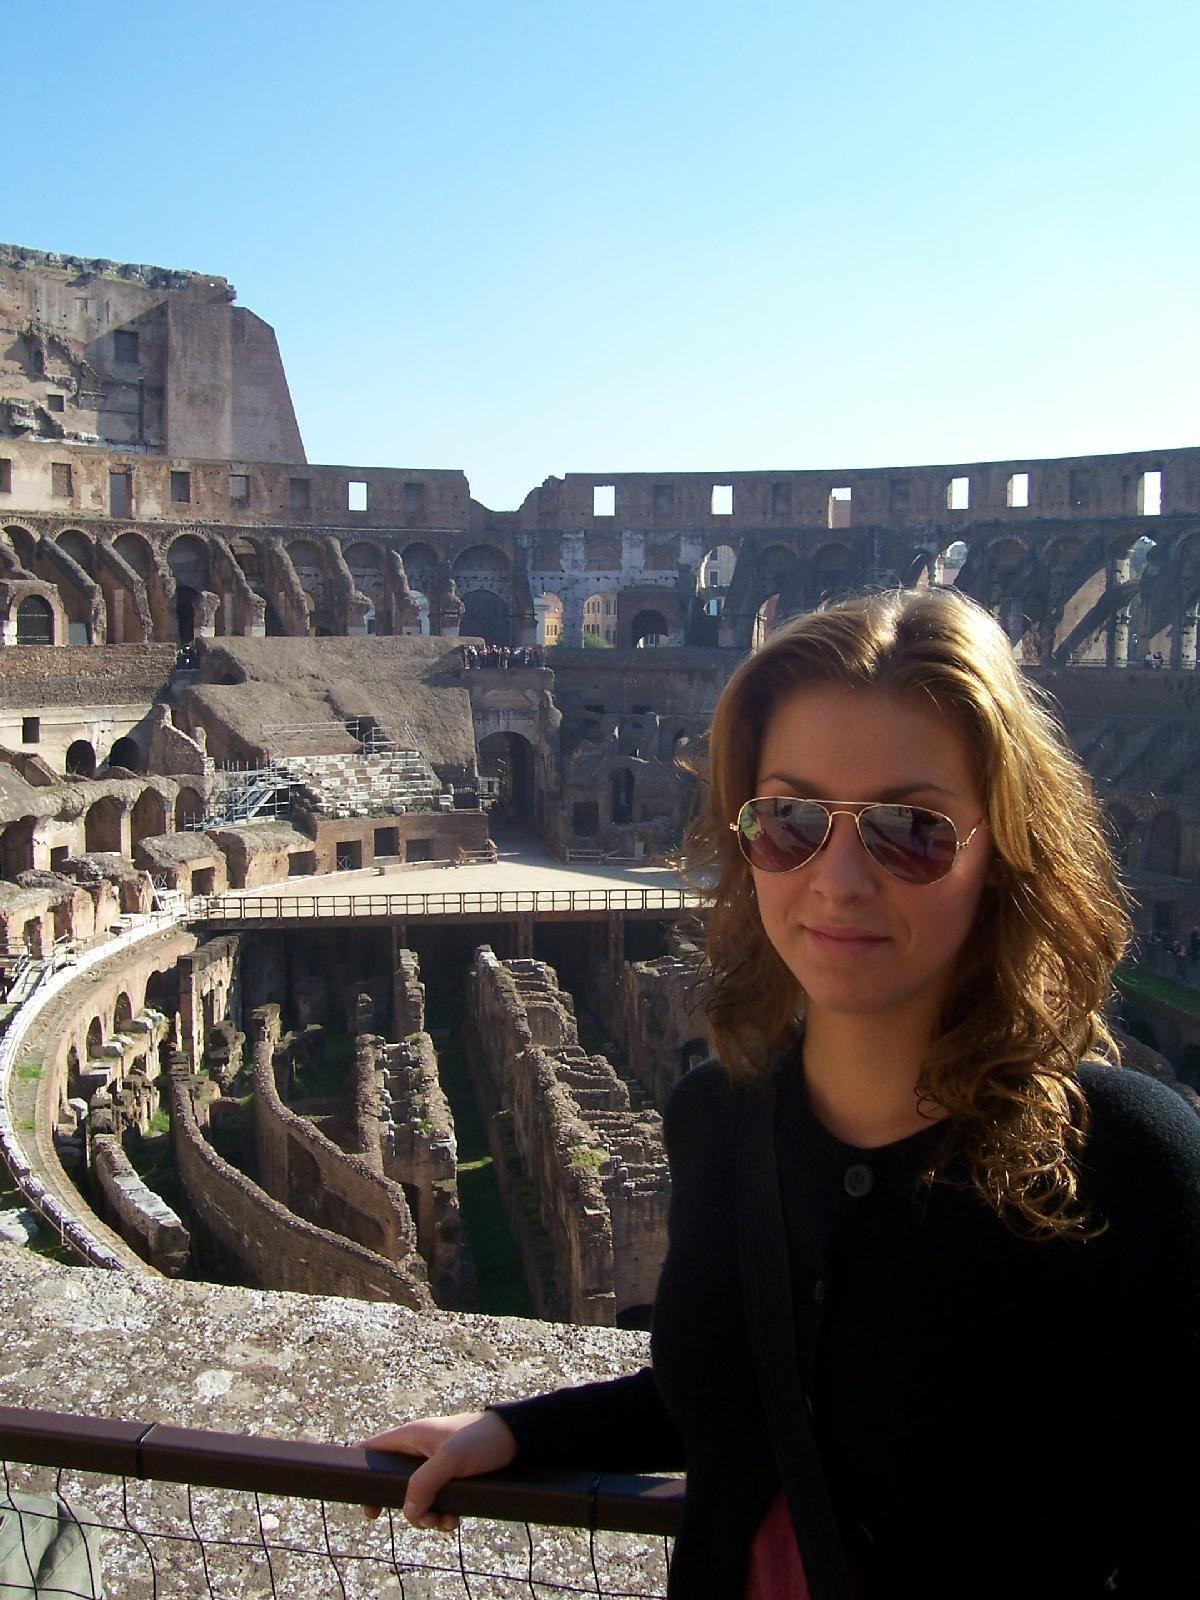 Colosseum #Italie #Rome 2006